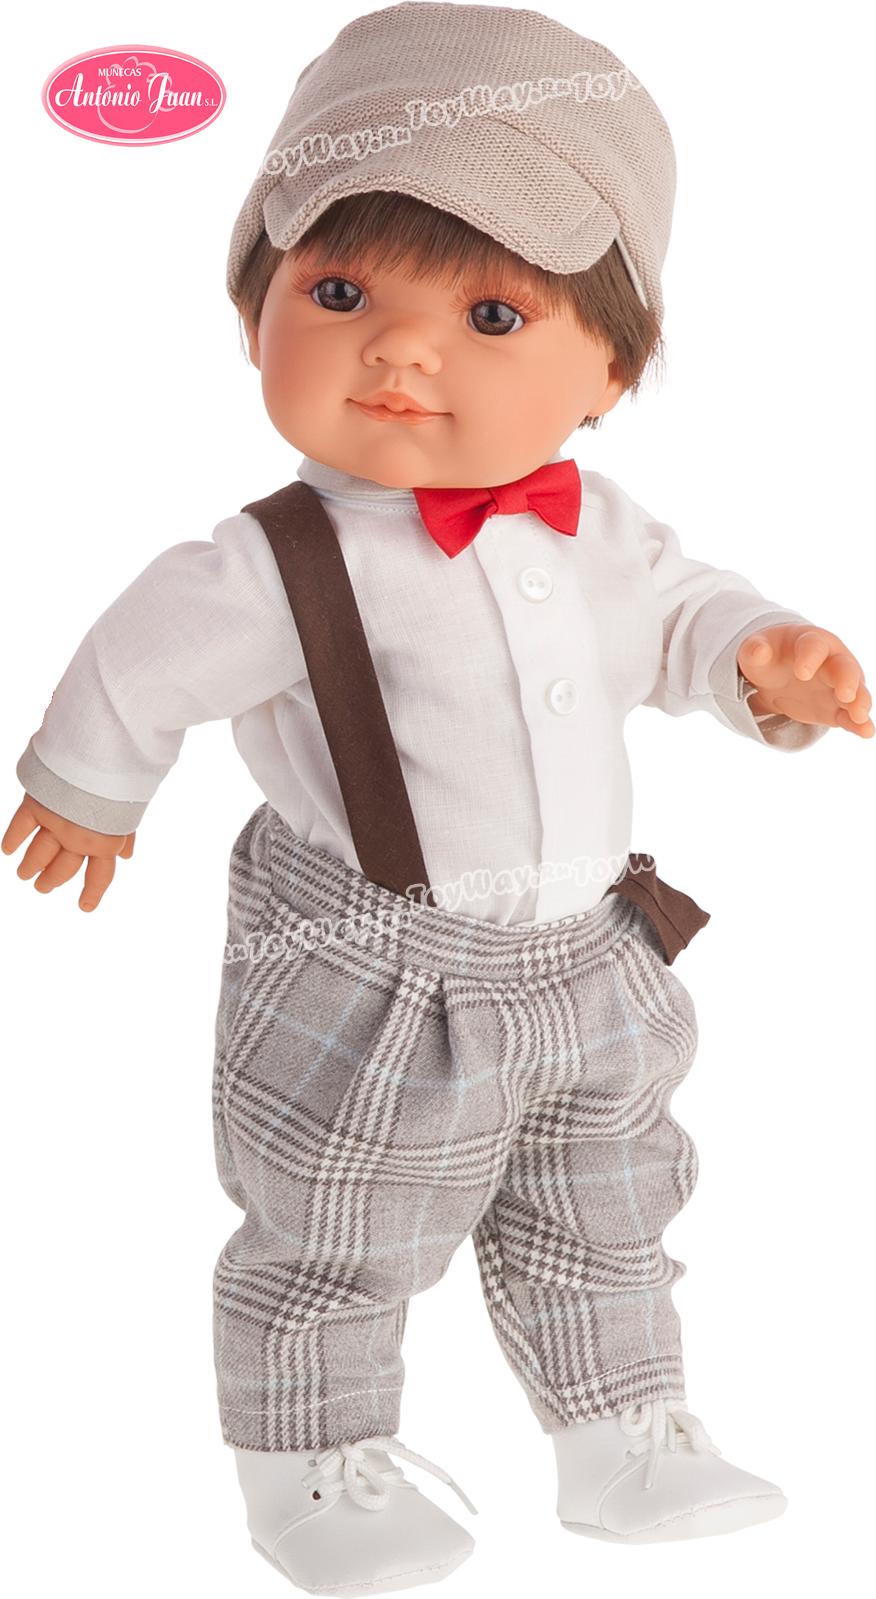 Кукла Фернандо, 38 см.Куклы Антонио Хуан (Antonio Juan Munecas)<br>Кукла Фернандо, 38 см.<br>